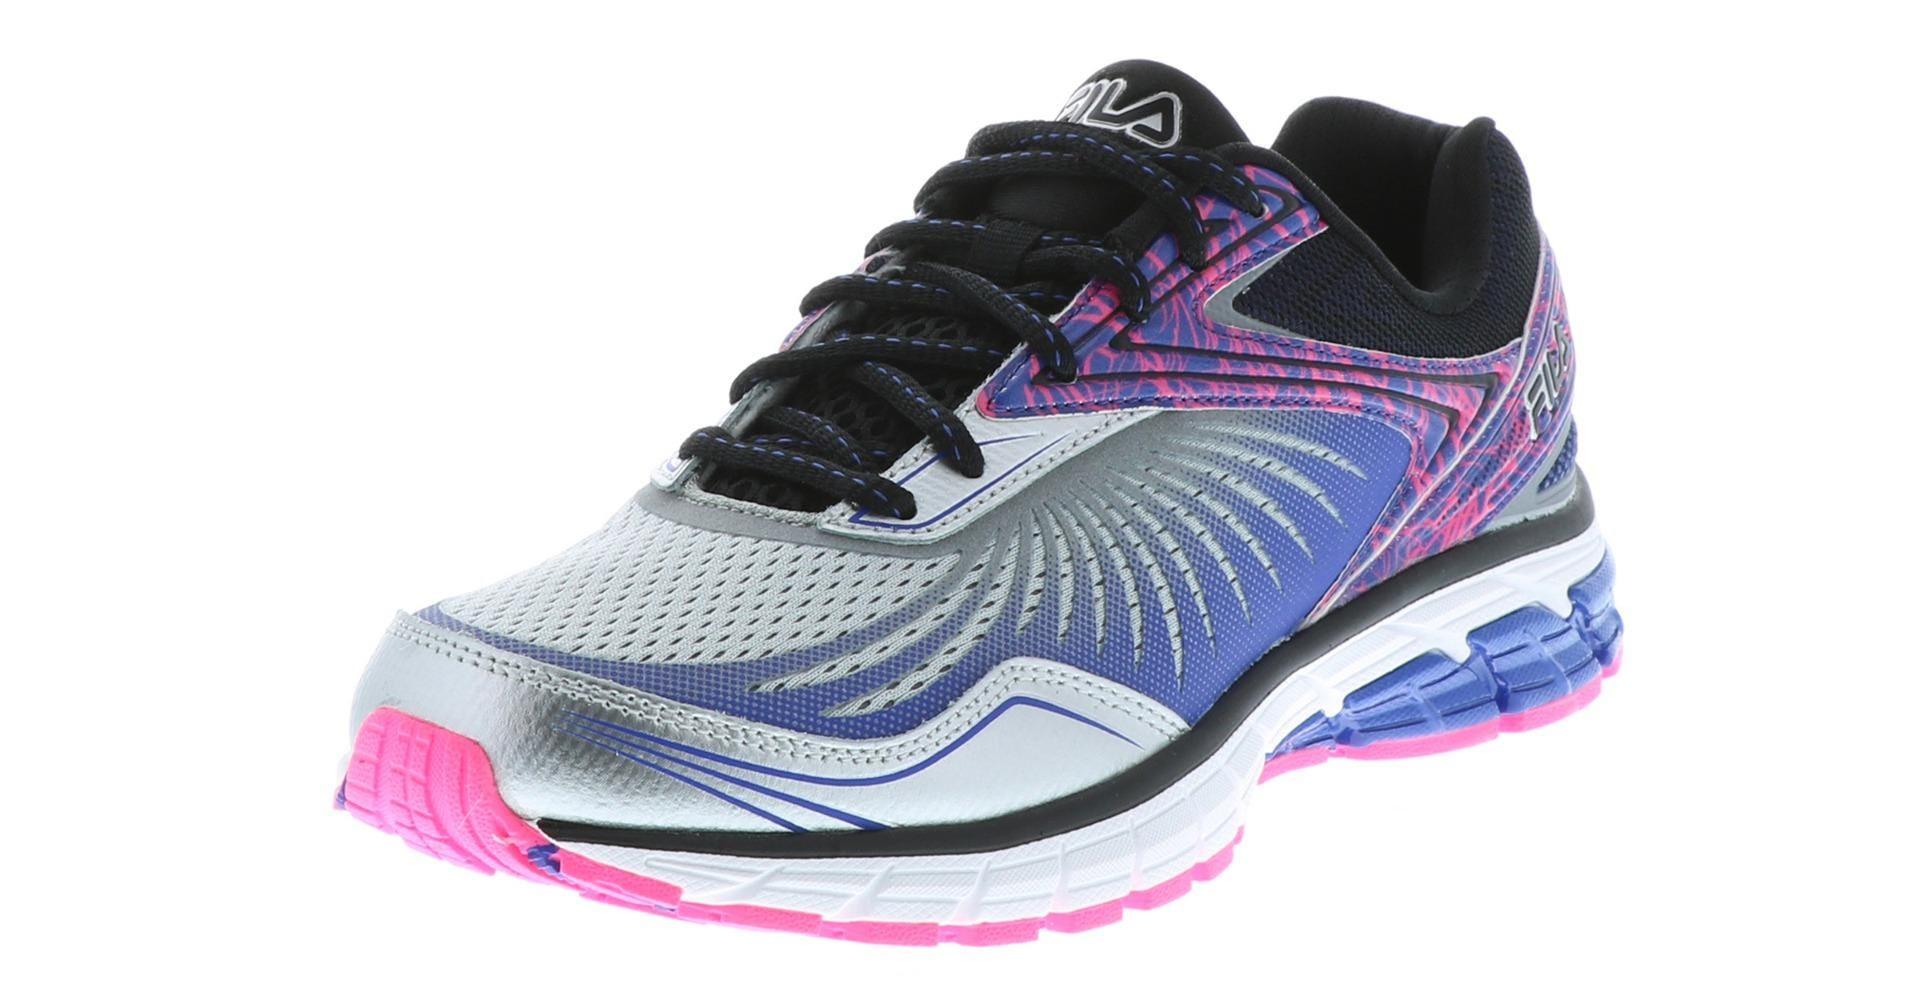 FILA Women's Aspect 3 Energized Athletic ShoesSkosensation Shoe Sensation